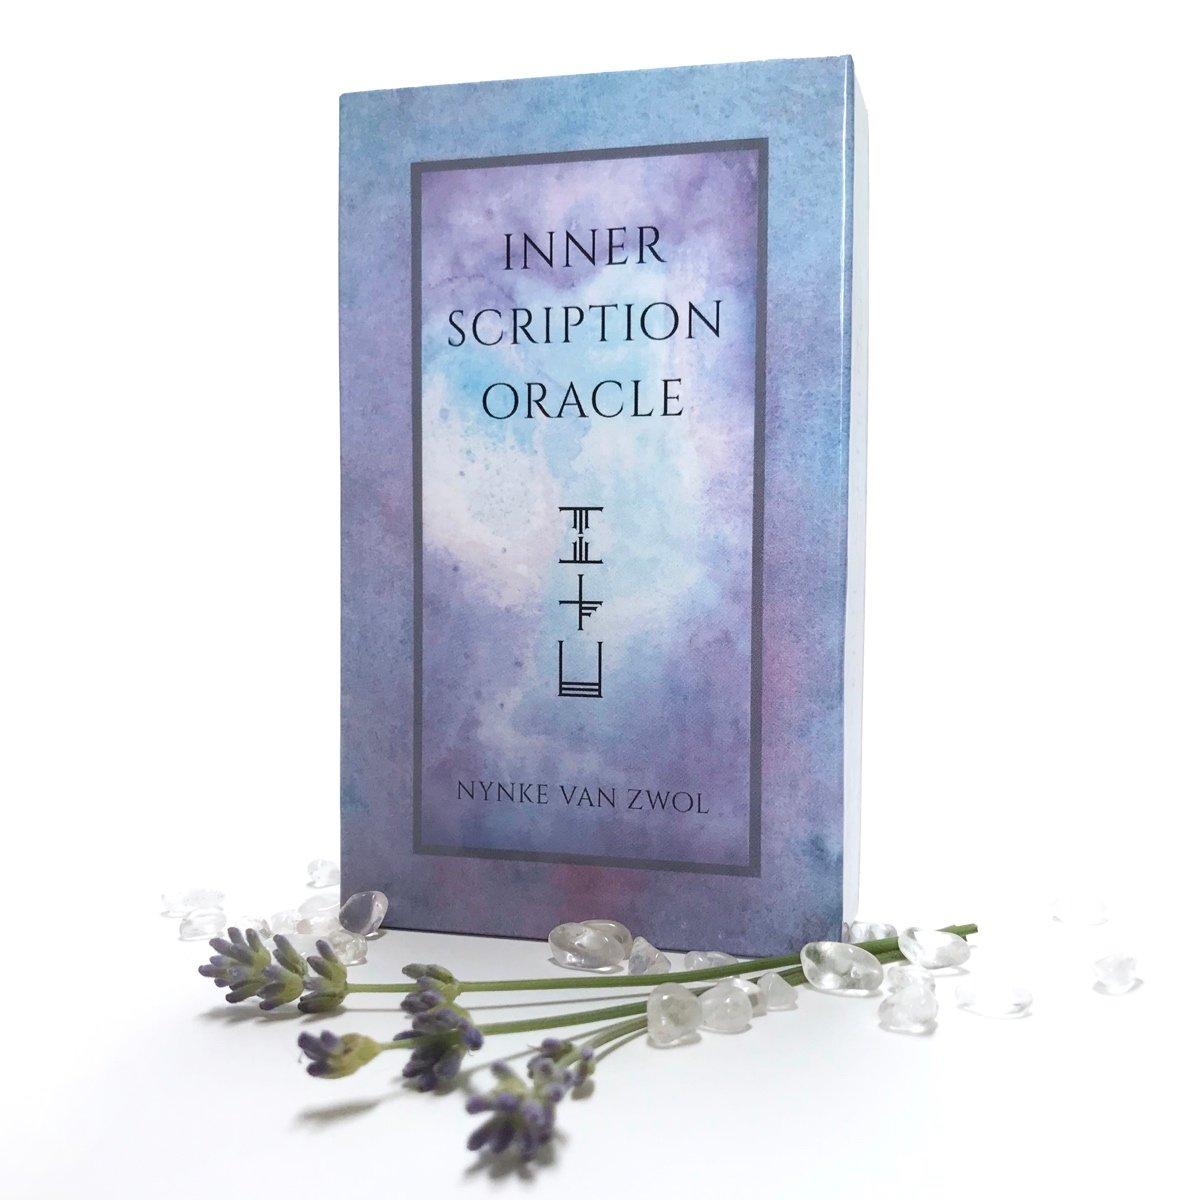 Image of Inner Scription Oracle